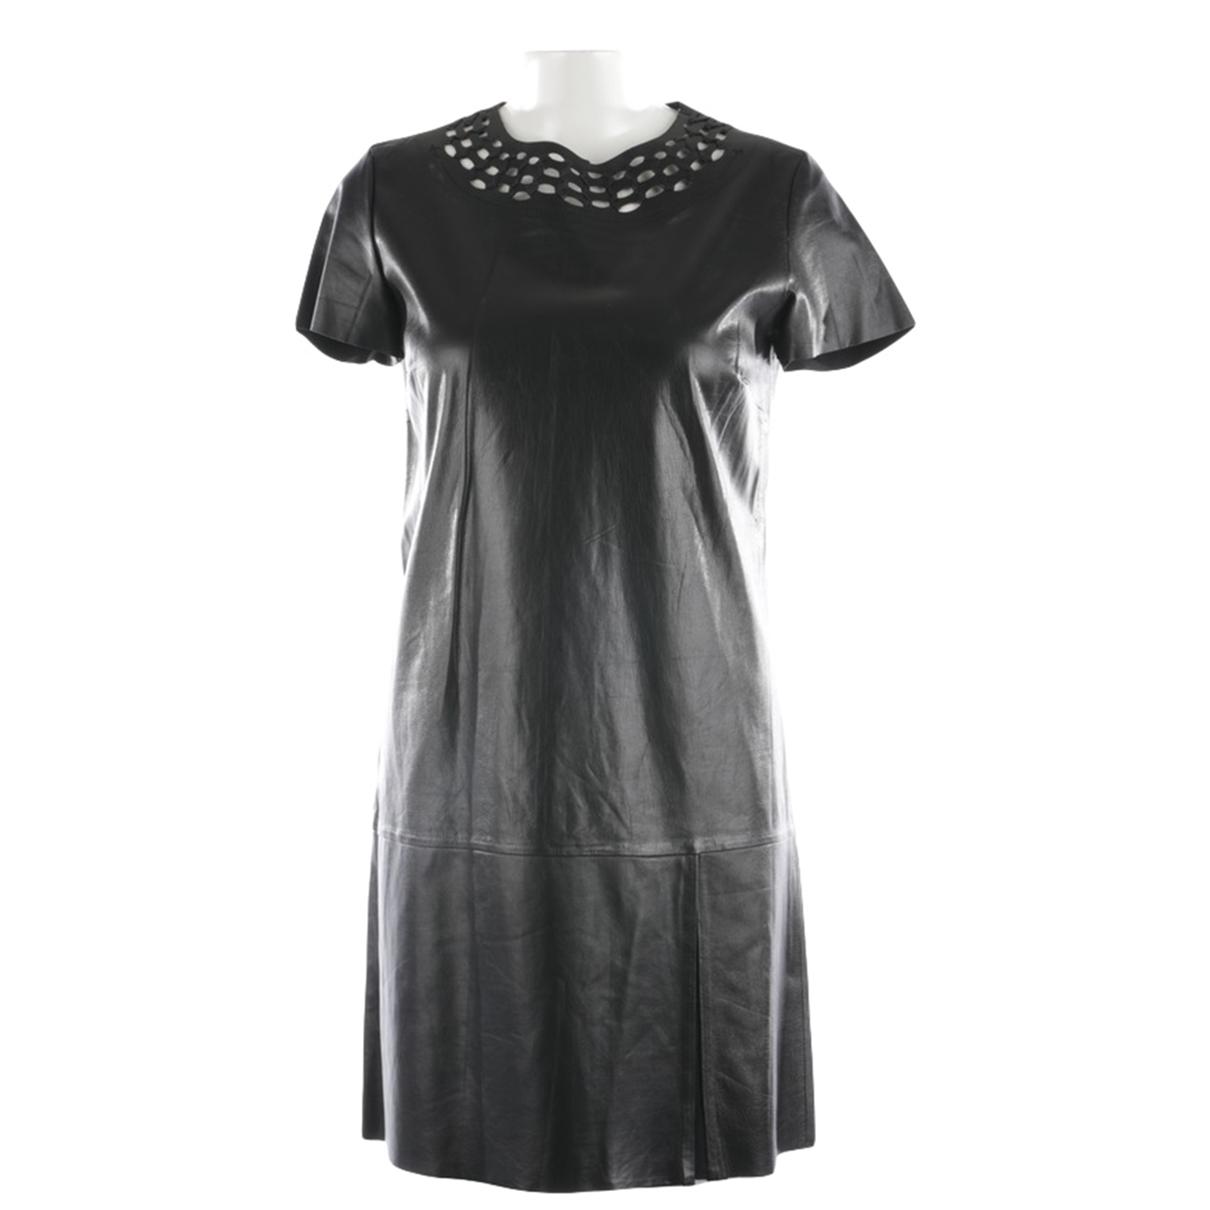 Vestido de Cuero Diane Von Furstenberg